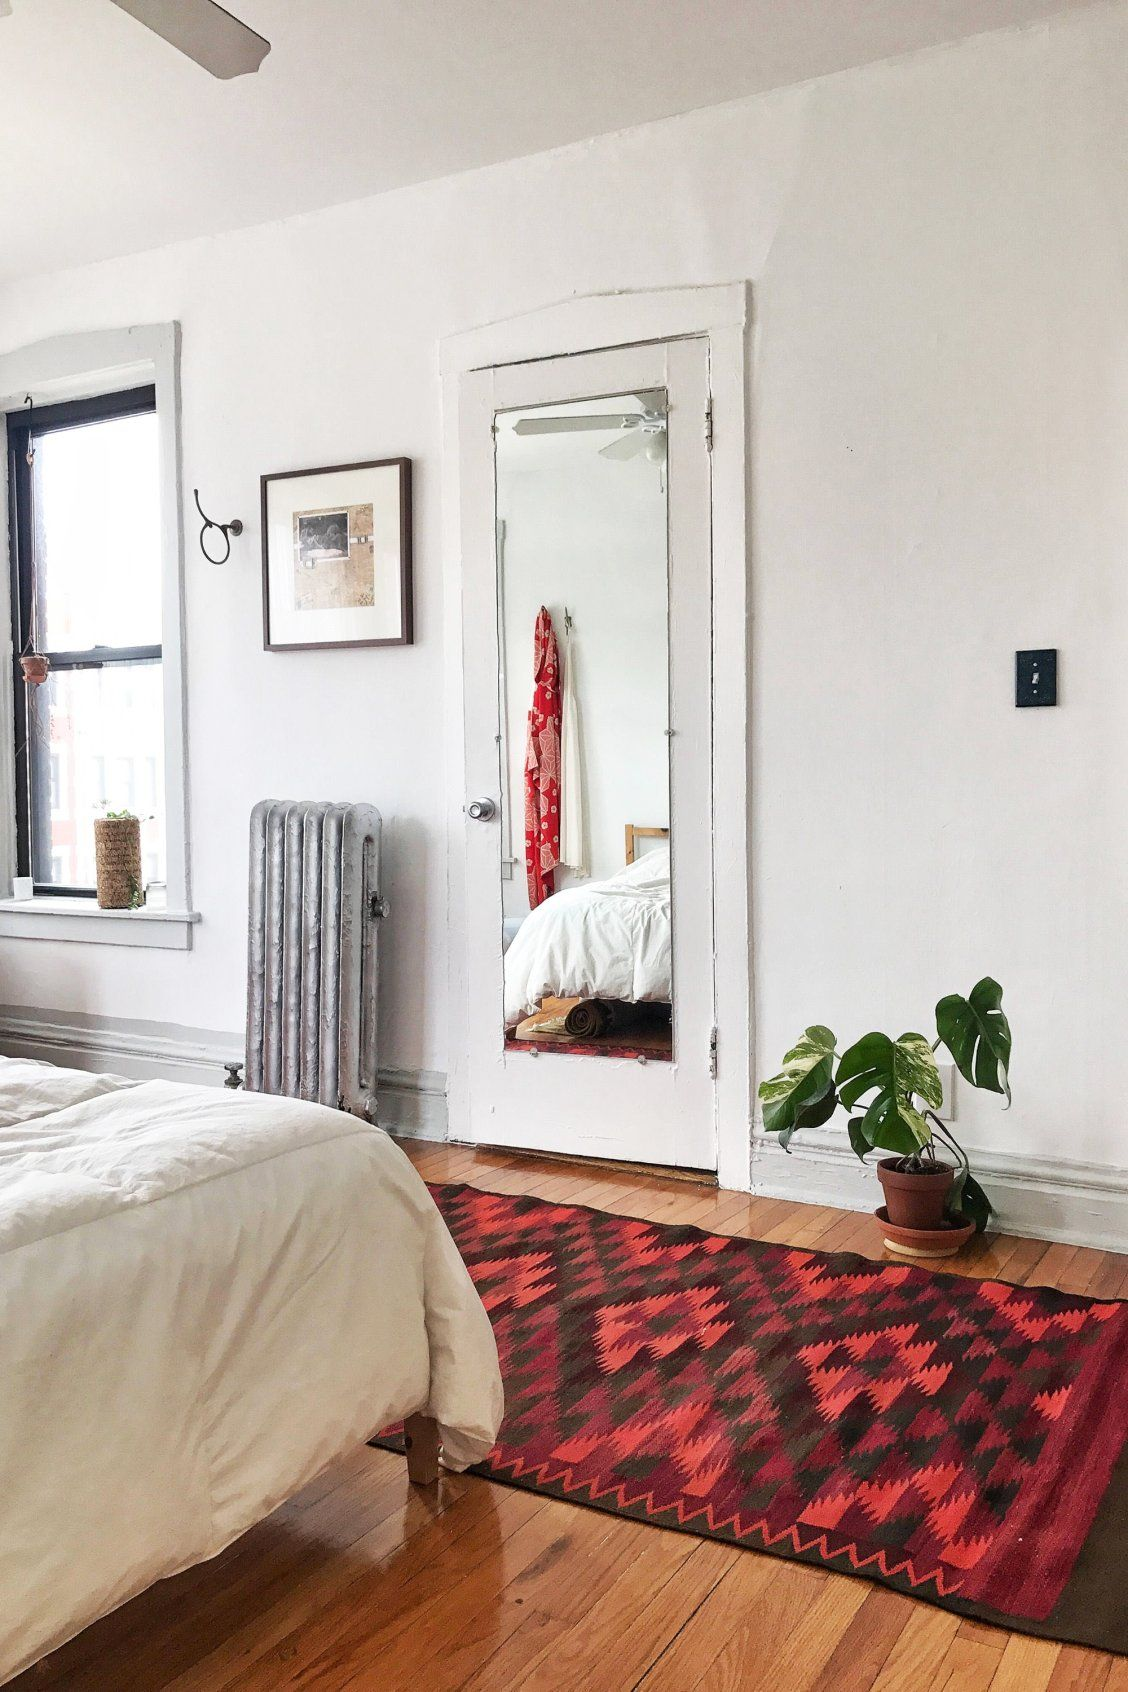 The Raspberry Clair   Home Decor in 2019   Decor, Home decor ...